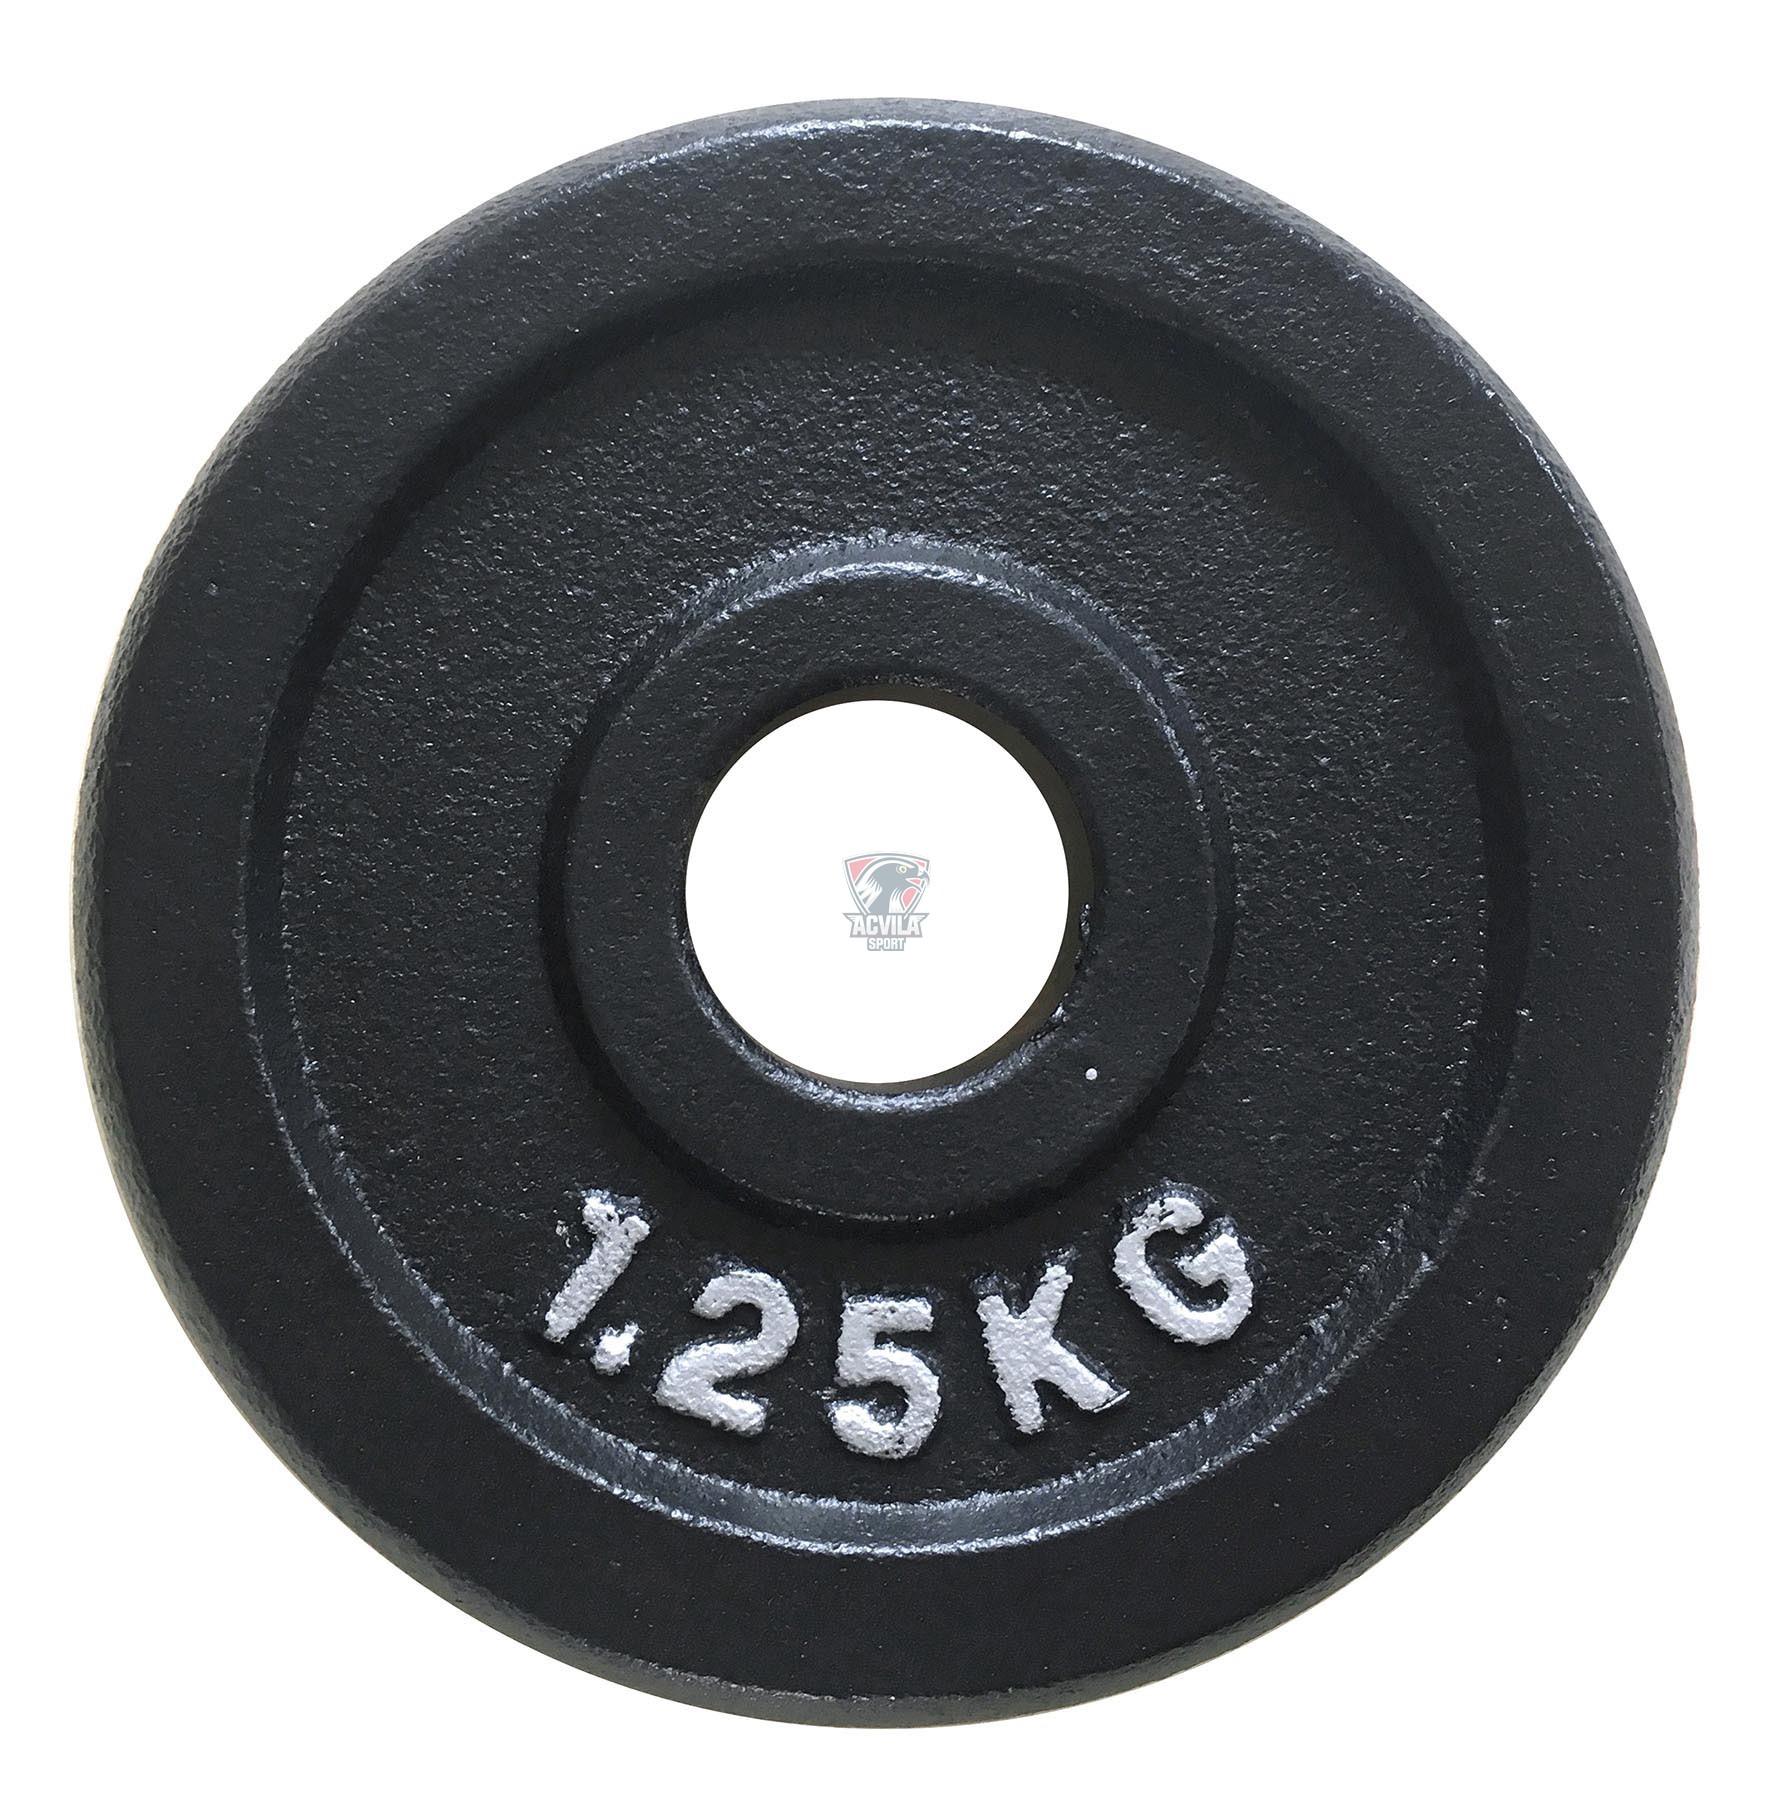 photo Greutate haltere 1,25 kg